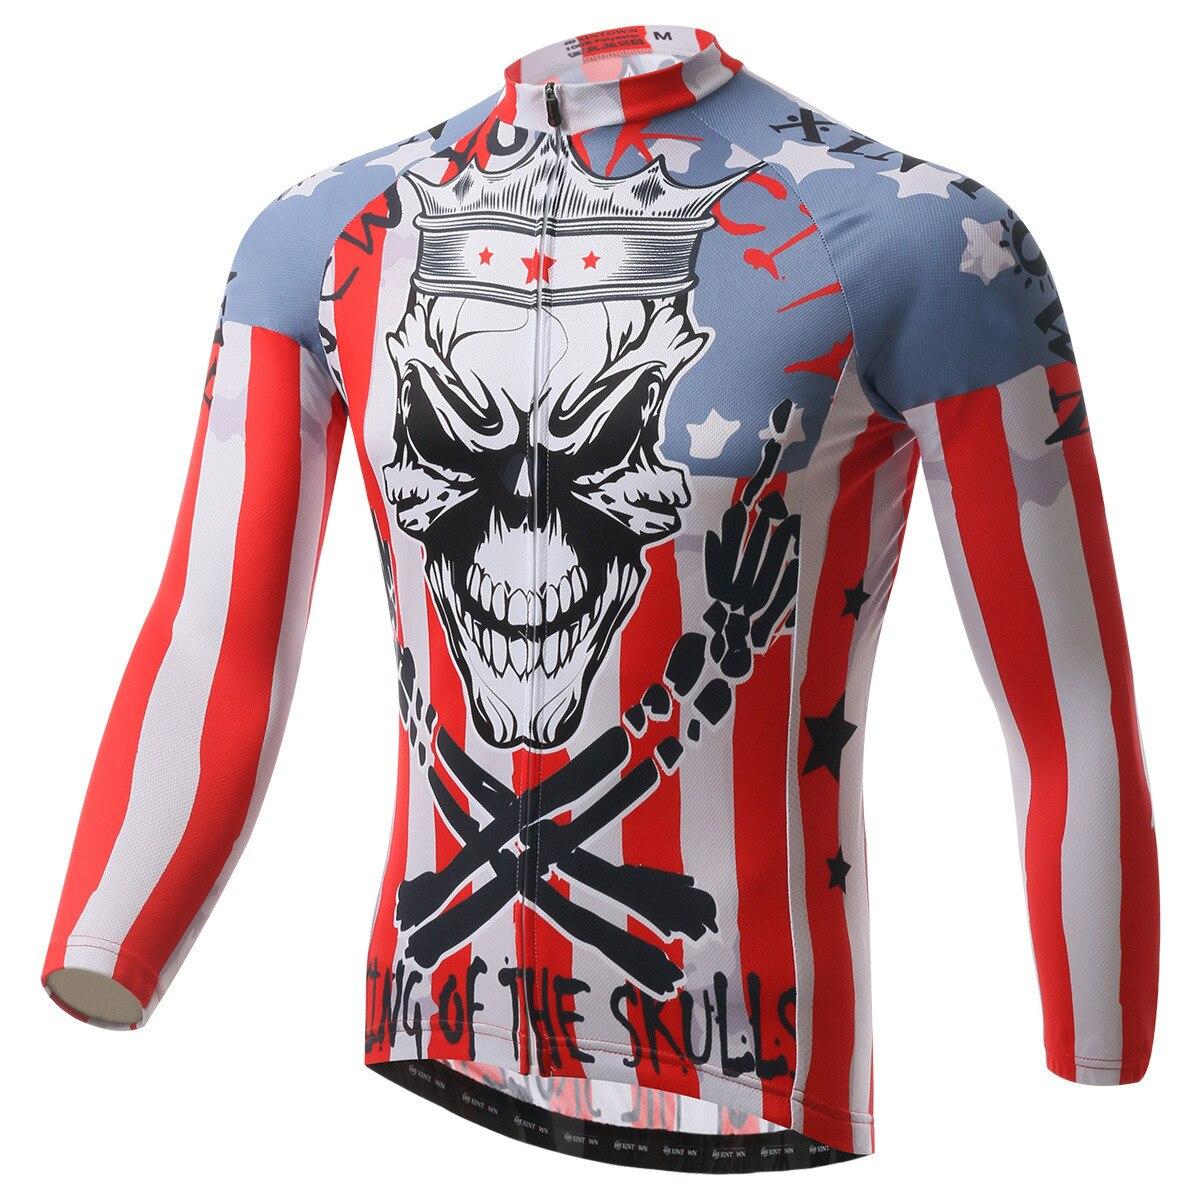 XINTOWN hommes hiver polaire nouveau produit 2018 Moto Jersey cyclisme Jersey VTT DH MX vtt vélo BMX Motocross Jersey